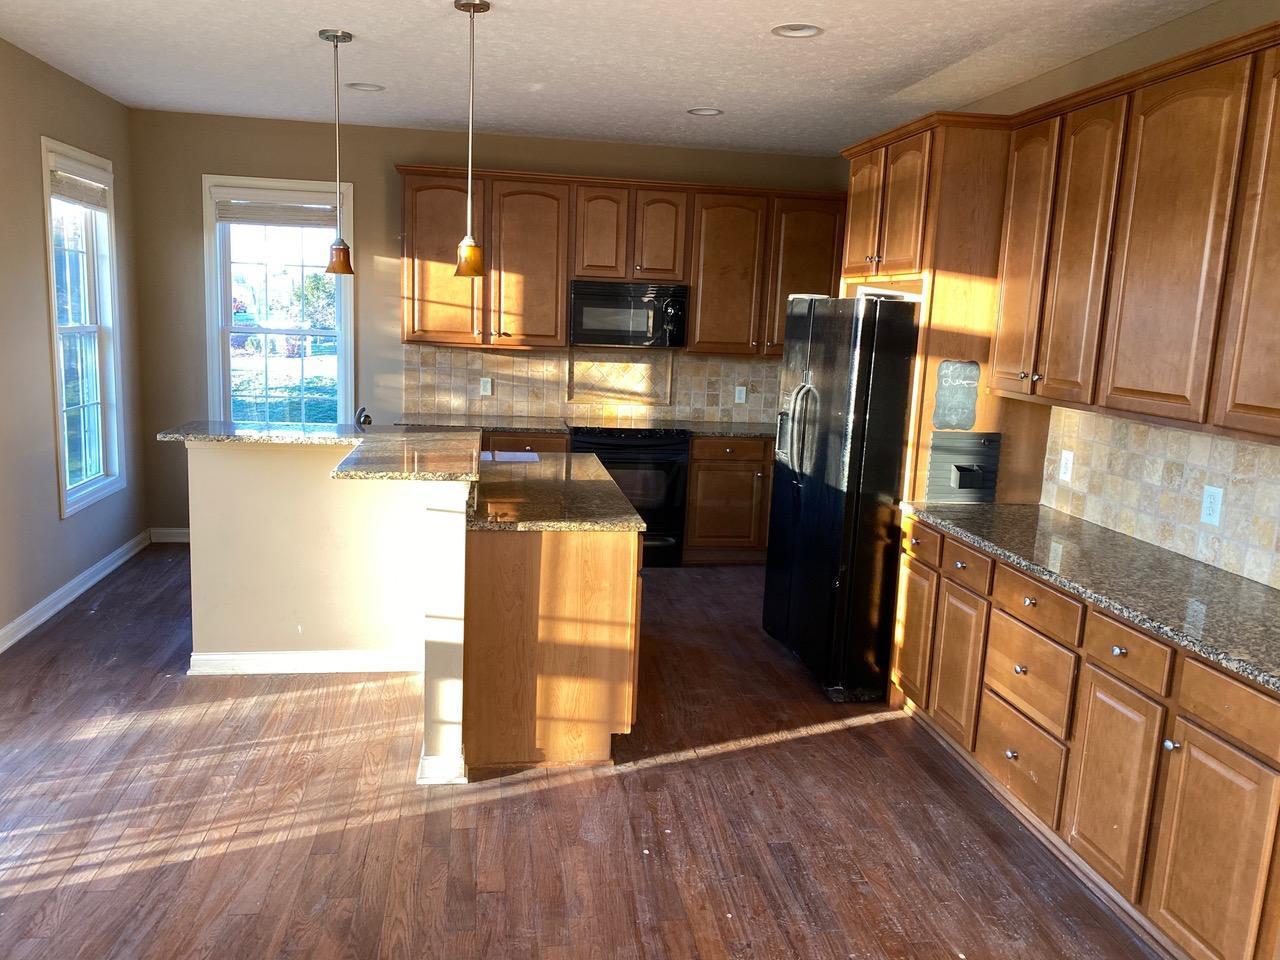 4757 Halle Circle, Hilliard, Ohio 43026, 3 Bedrooms Bedrooms, ,4 BathroomsBathrooms,Residential,For Sale,Halle,220040307